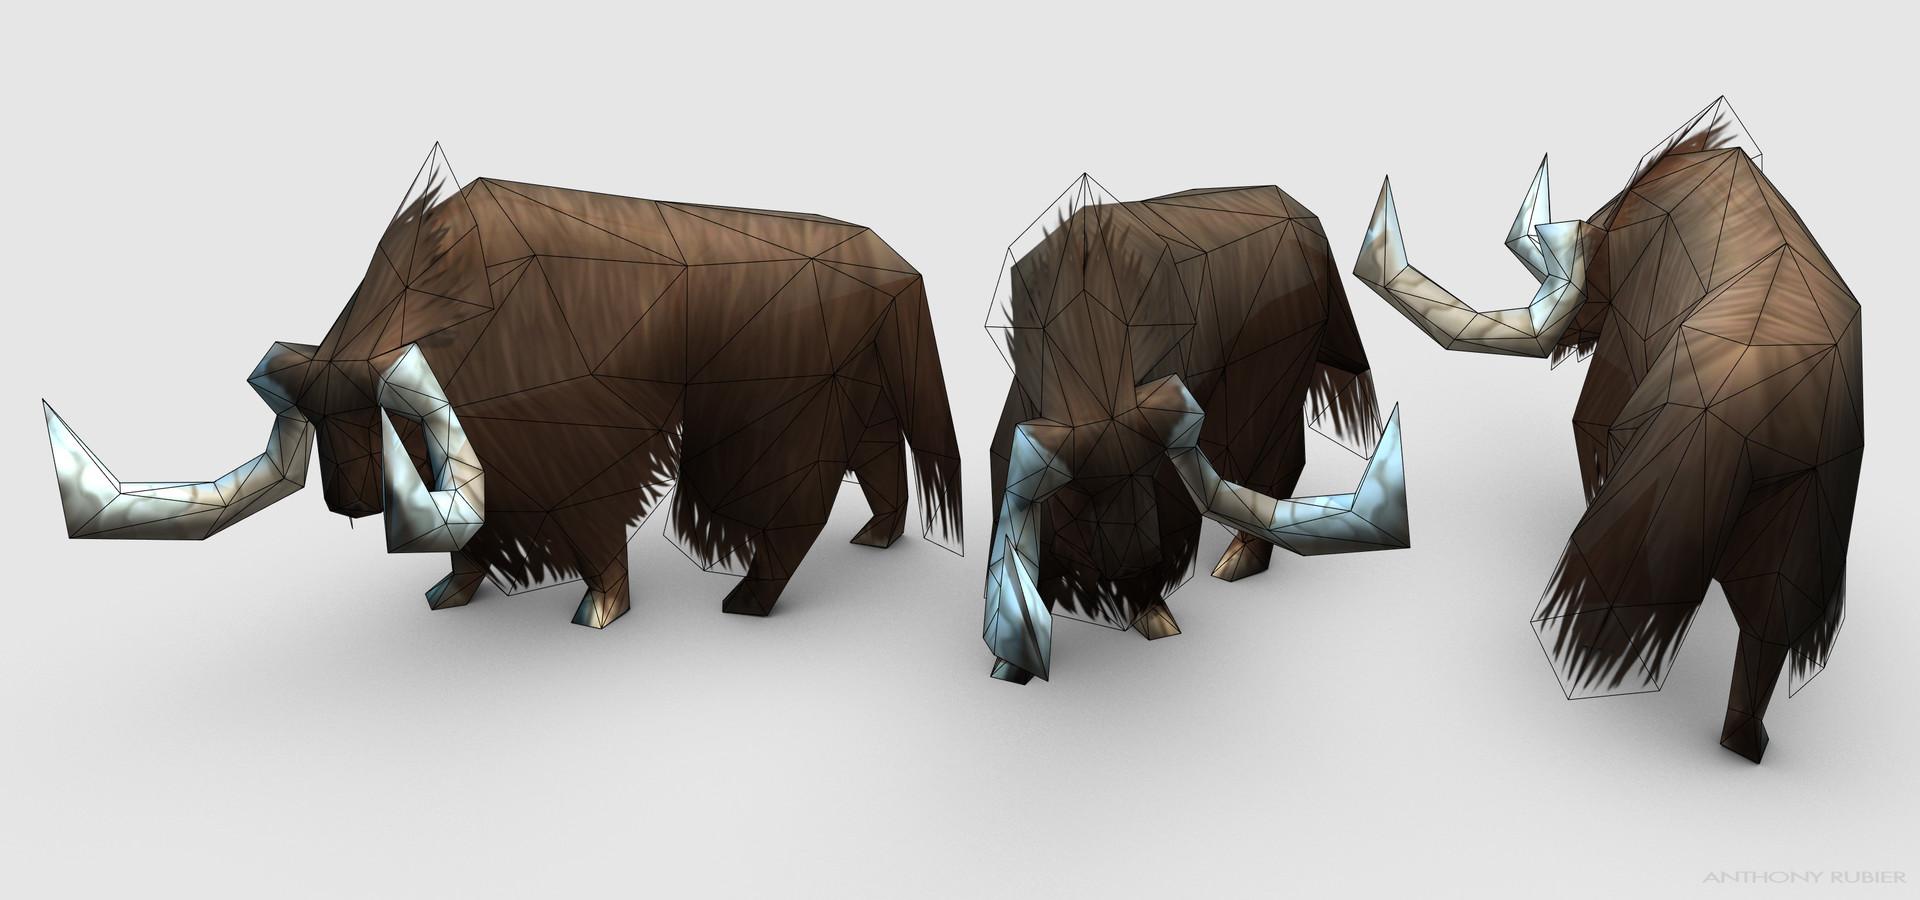 Anthony rubier render mesh yack 2